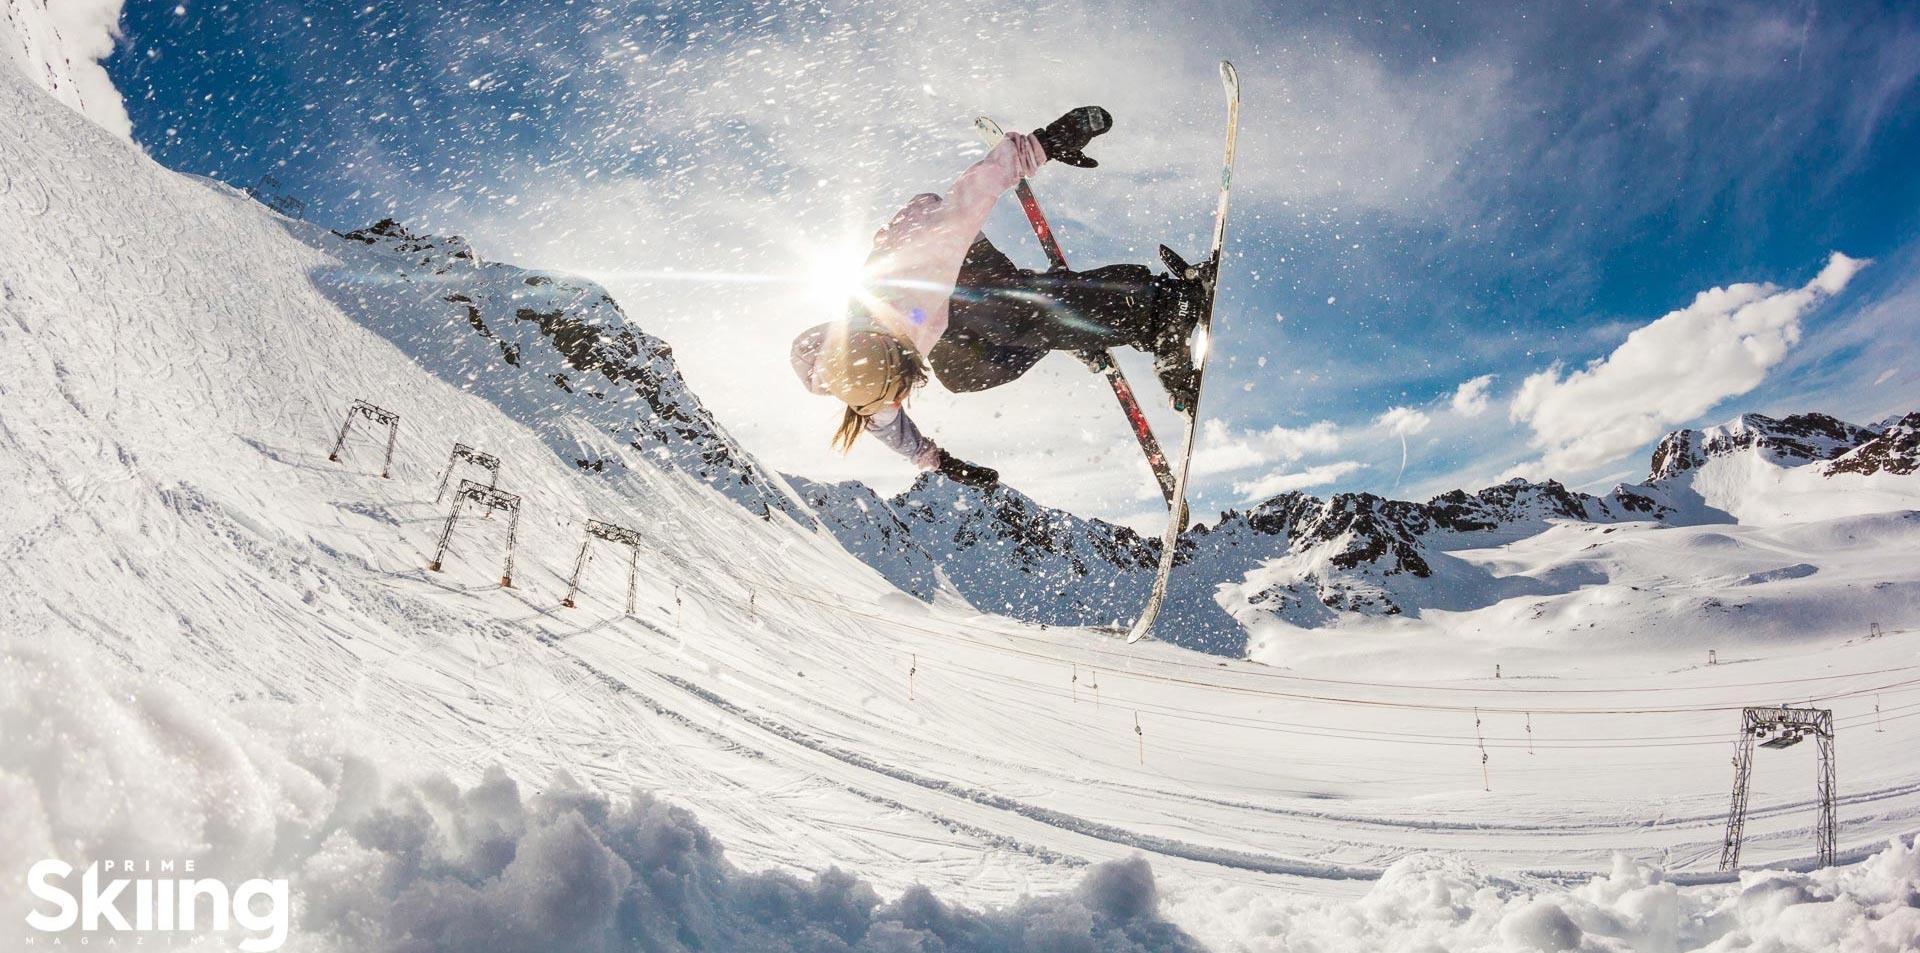 Spring Classics 2019 - Snowpark Kaunertal - Diese Woche geht's los!